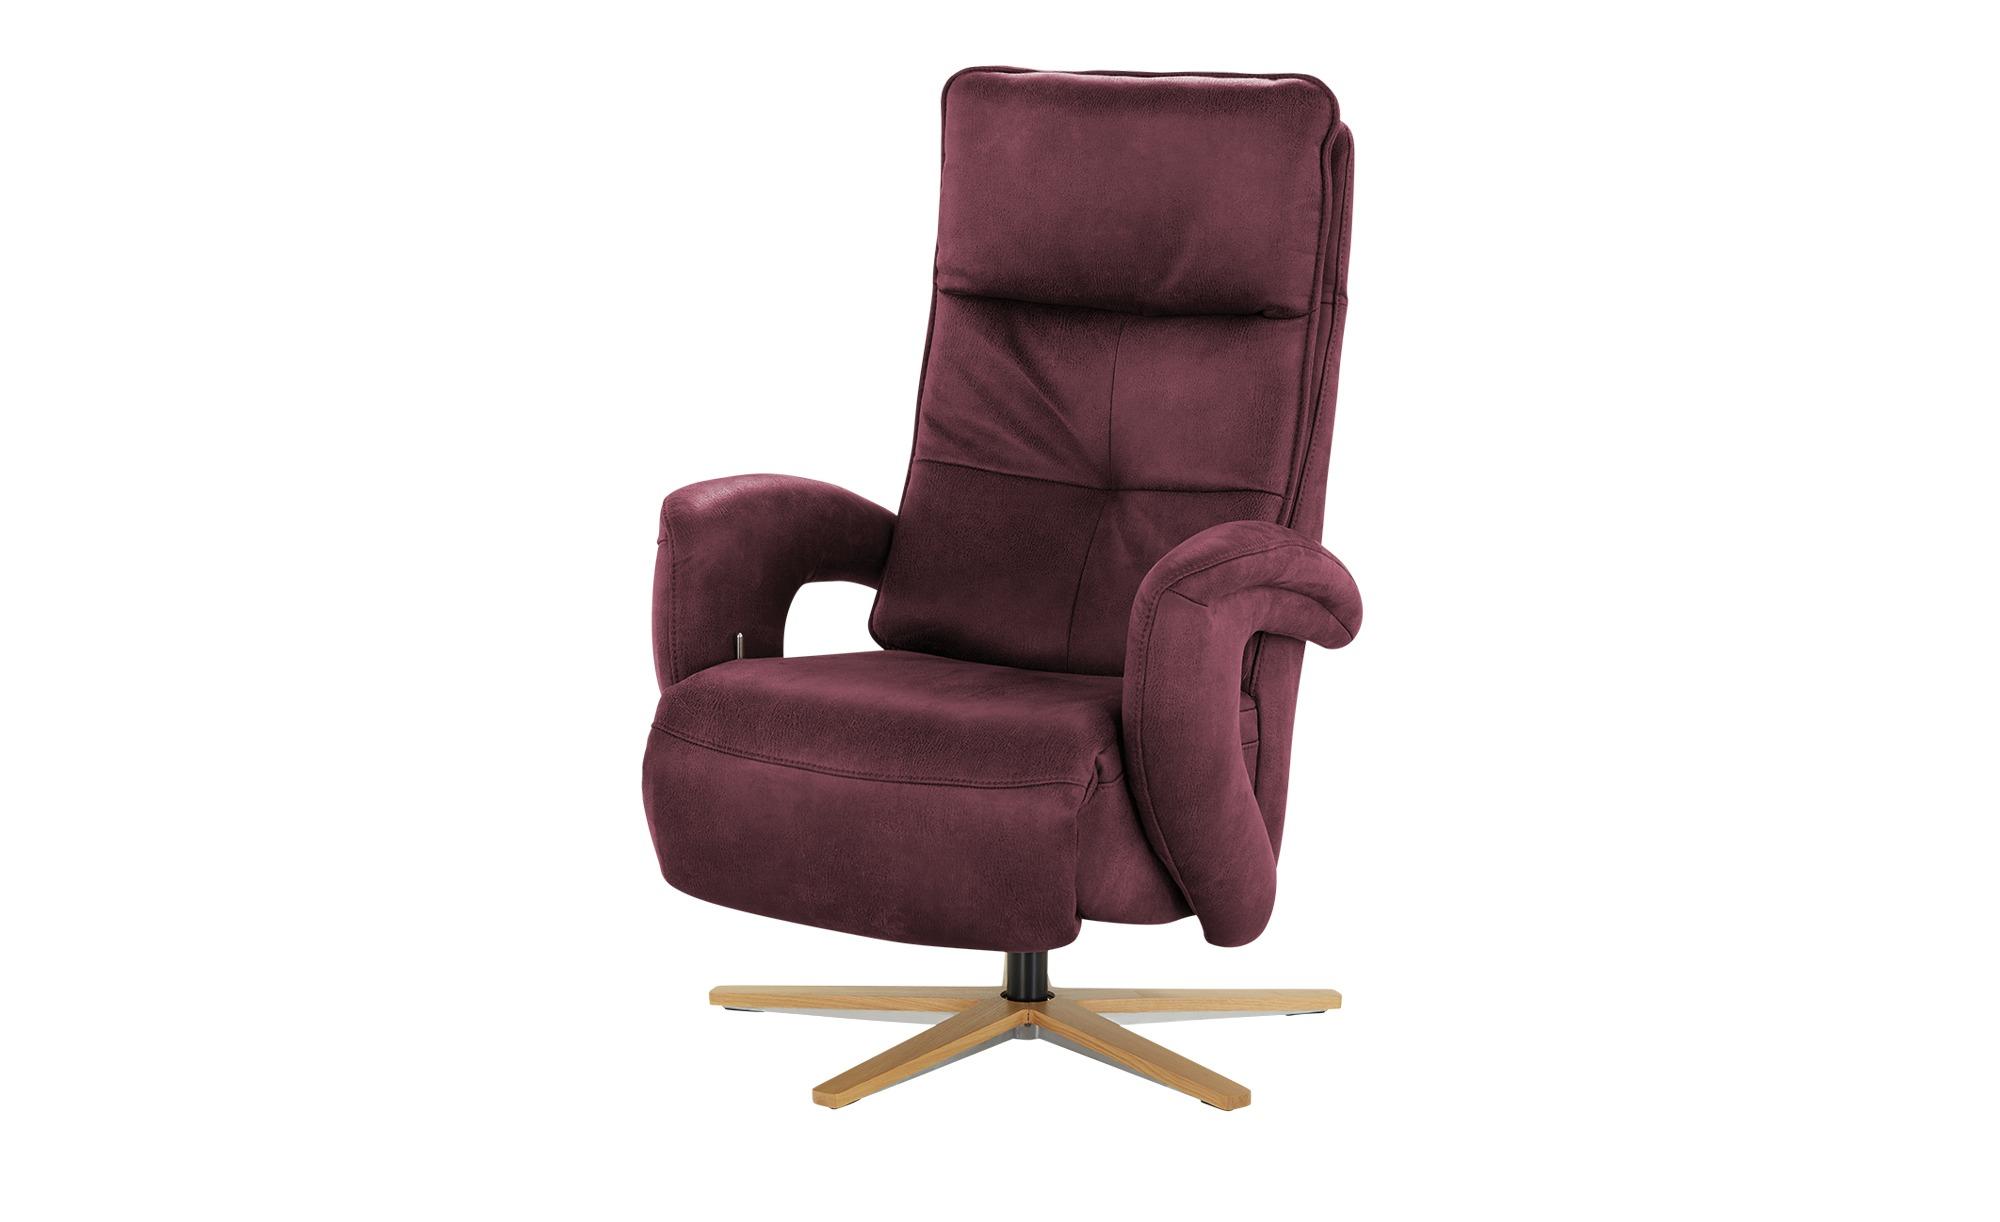 Relaxsessel  Edvin ¦ rot ¦ Maße (cm): B: 75 H: 112 T: 87 Polstermöbel > Sessel > Ledersessel - Höffner